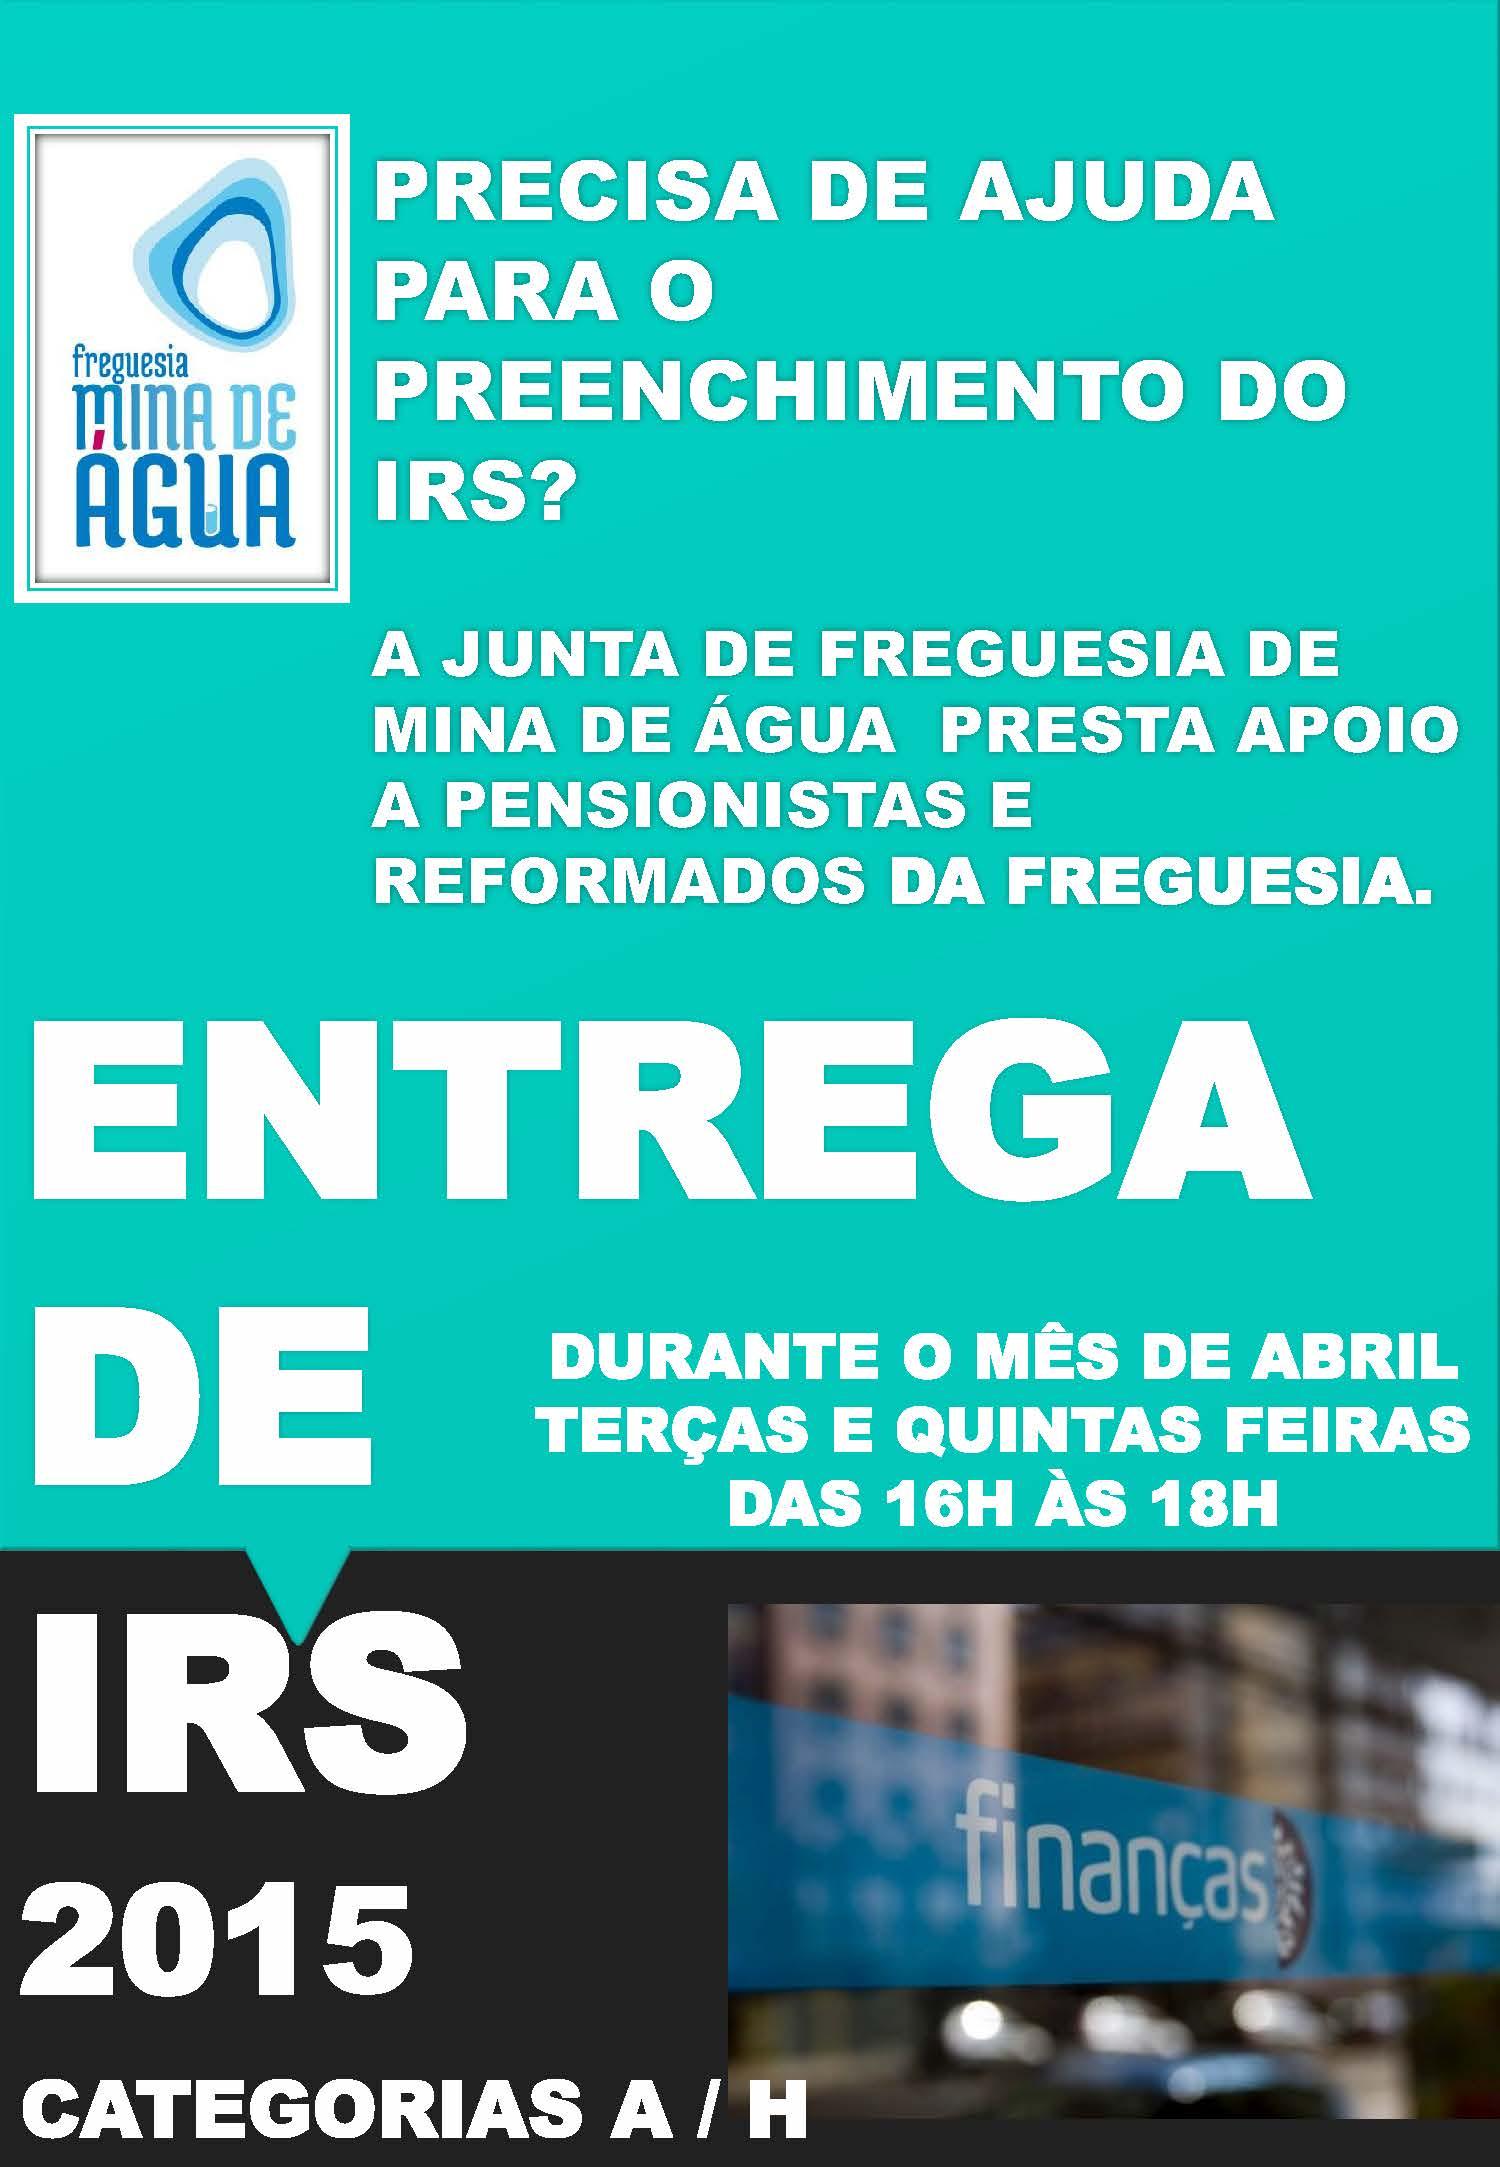 IRS de 2015 – Entrega gratuita